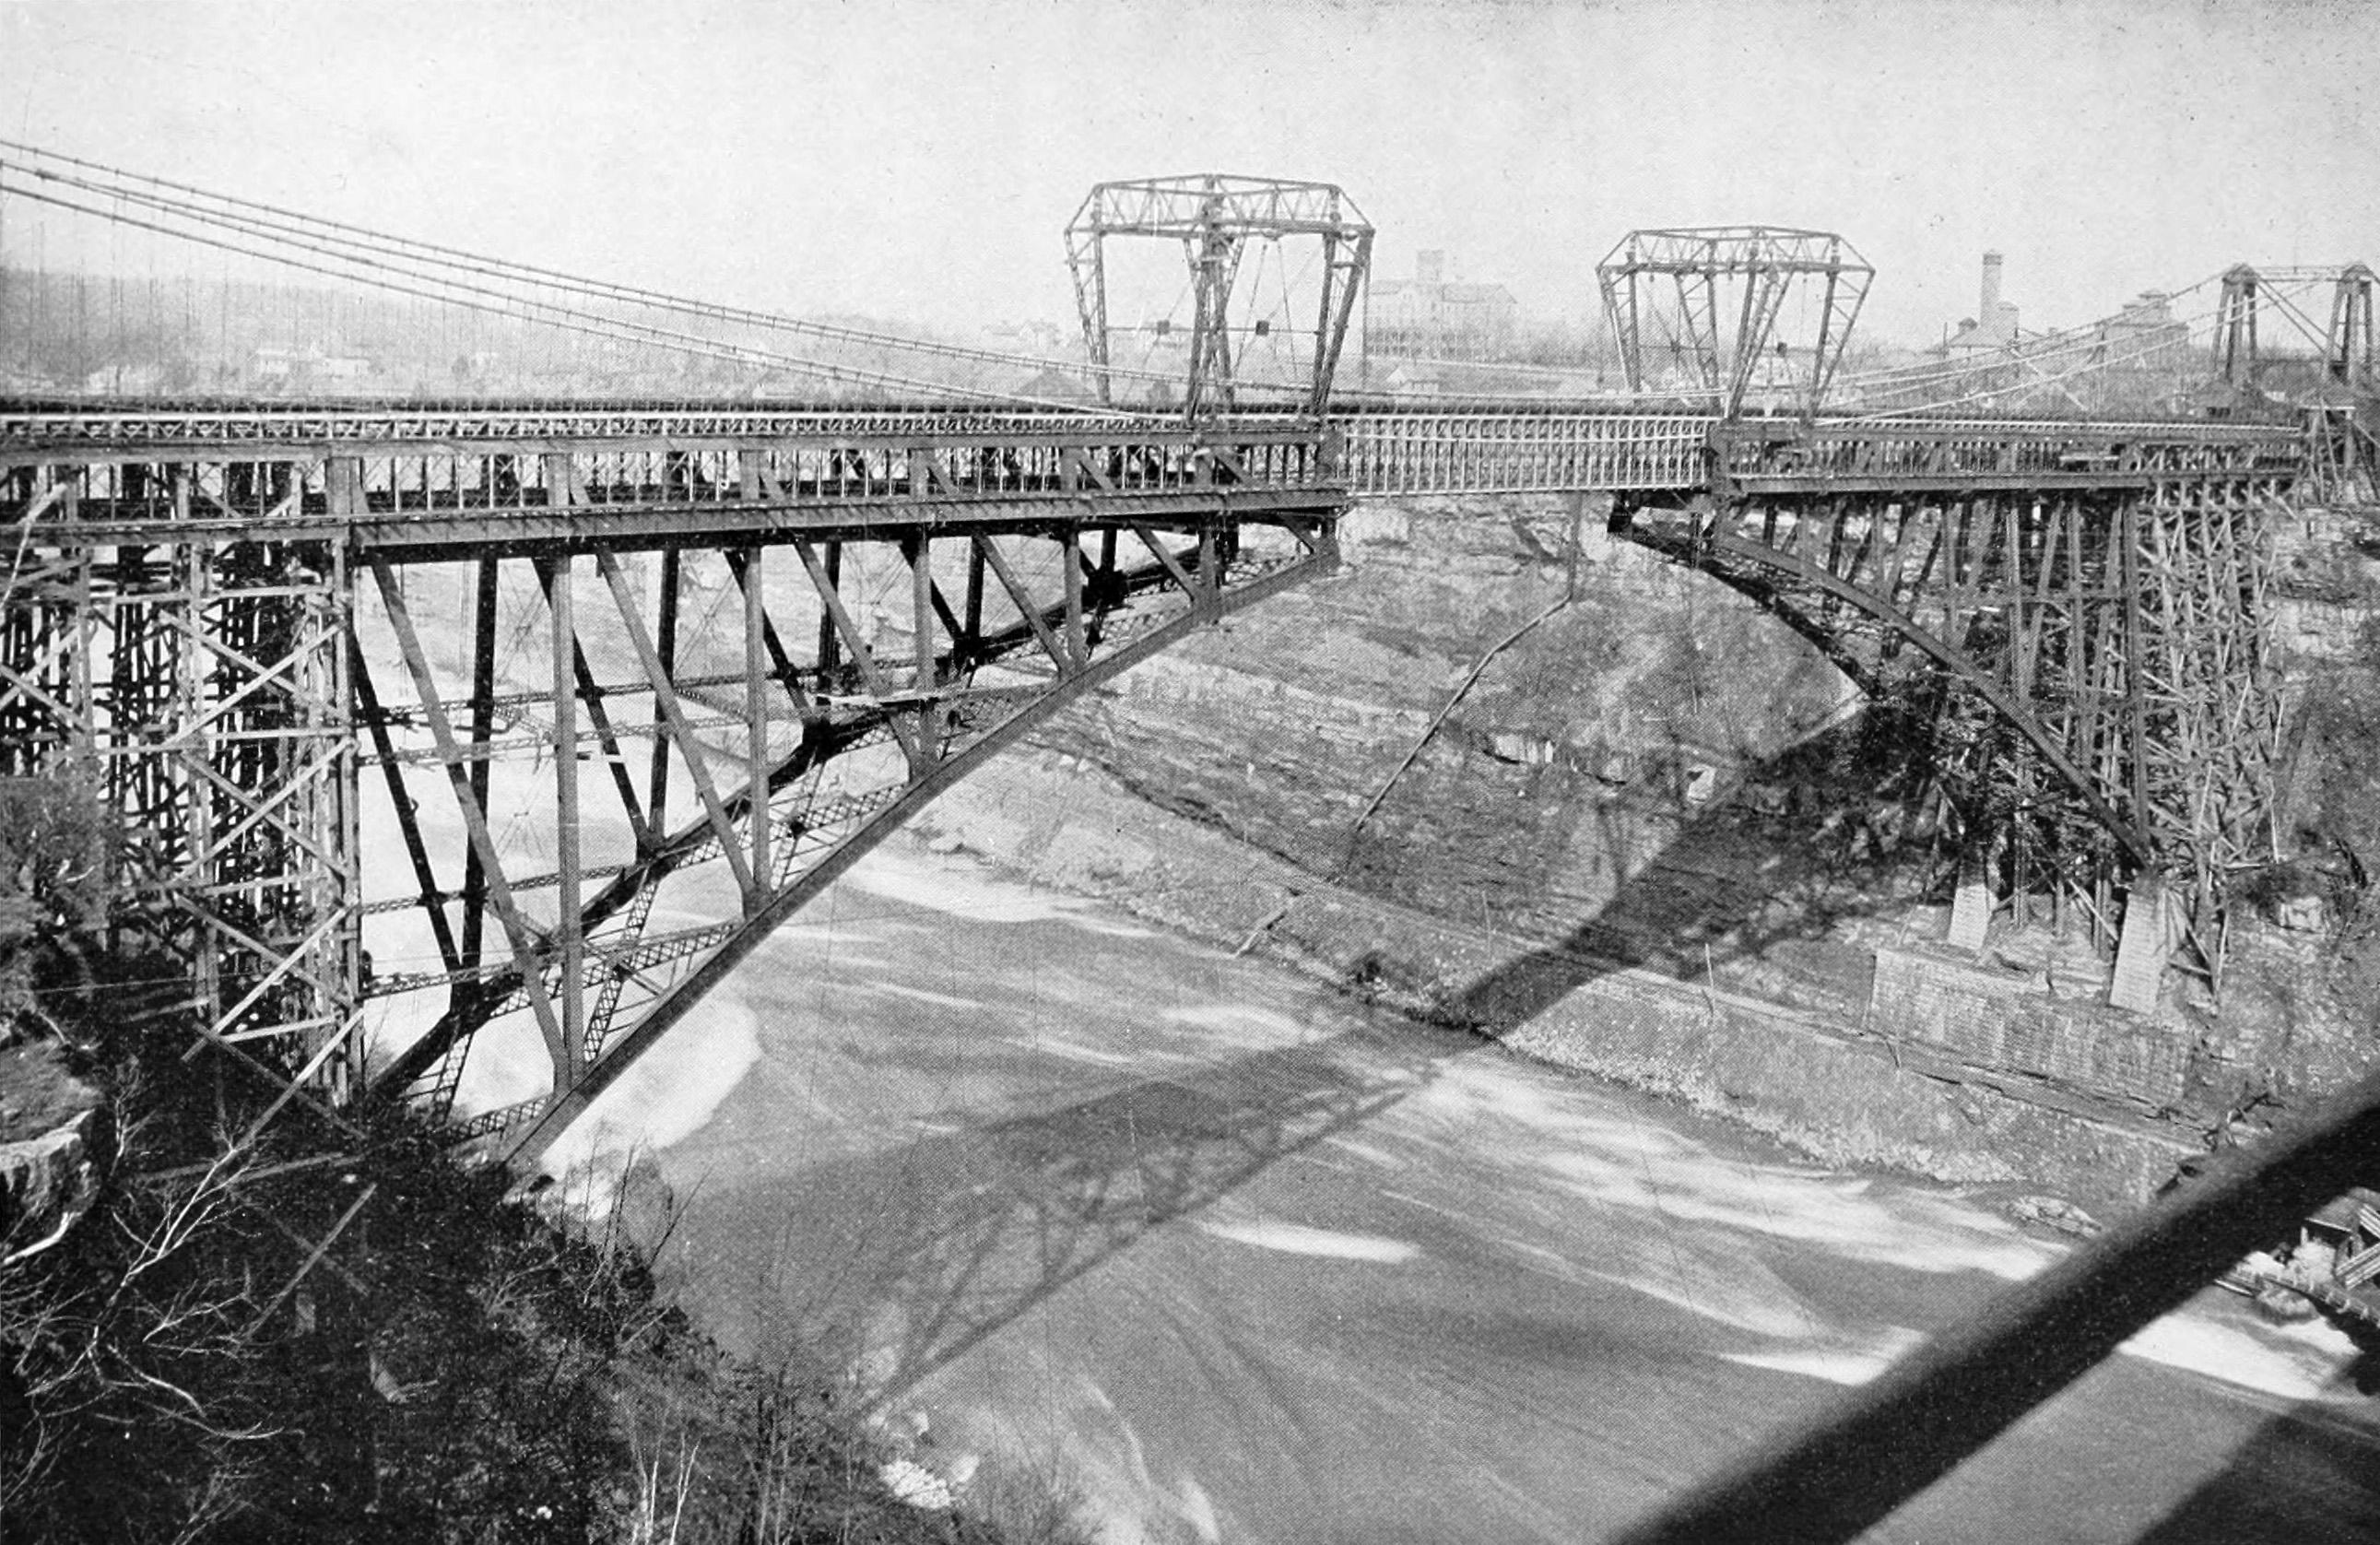 Whirlpool Black Ice File Niagara Falls Suspension Bridge To Lower Steel Arch